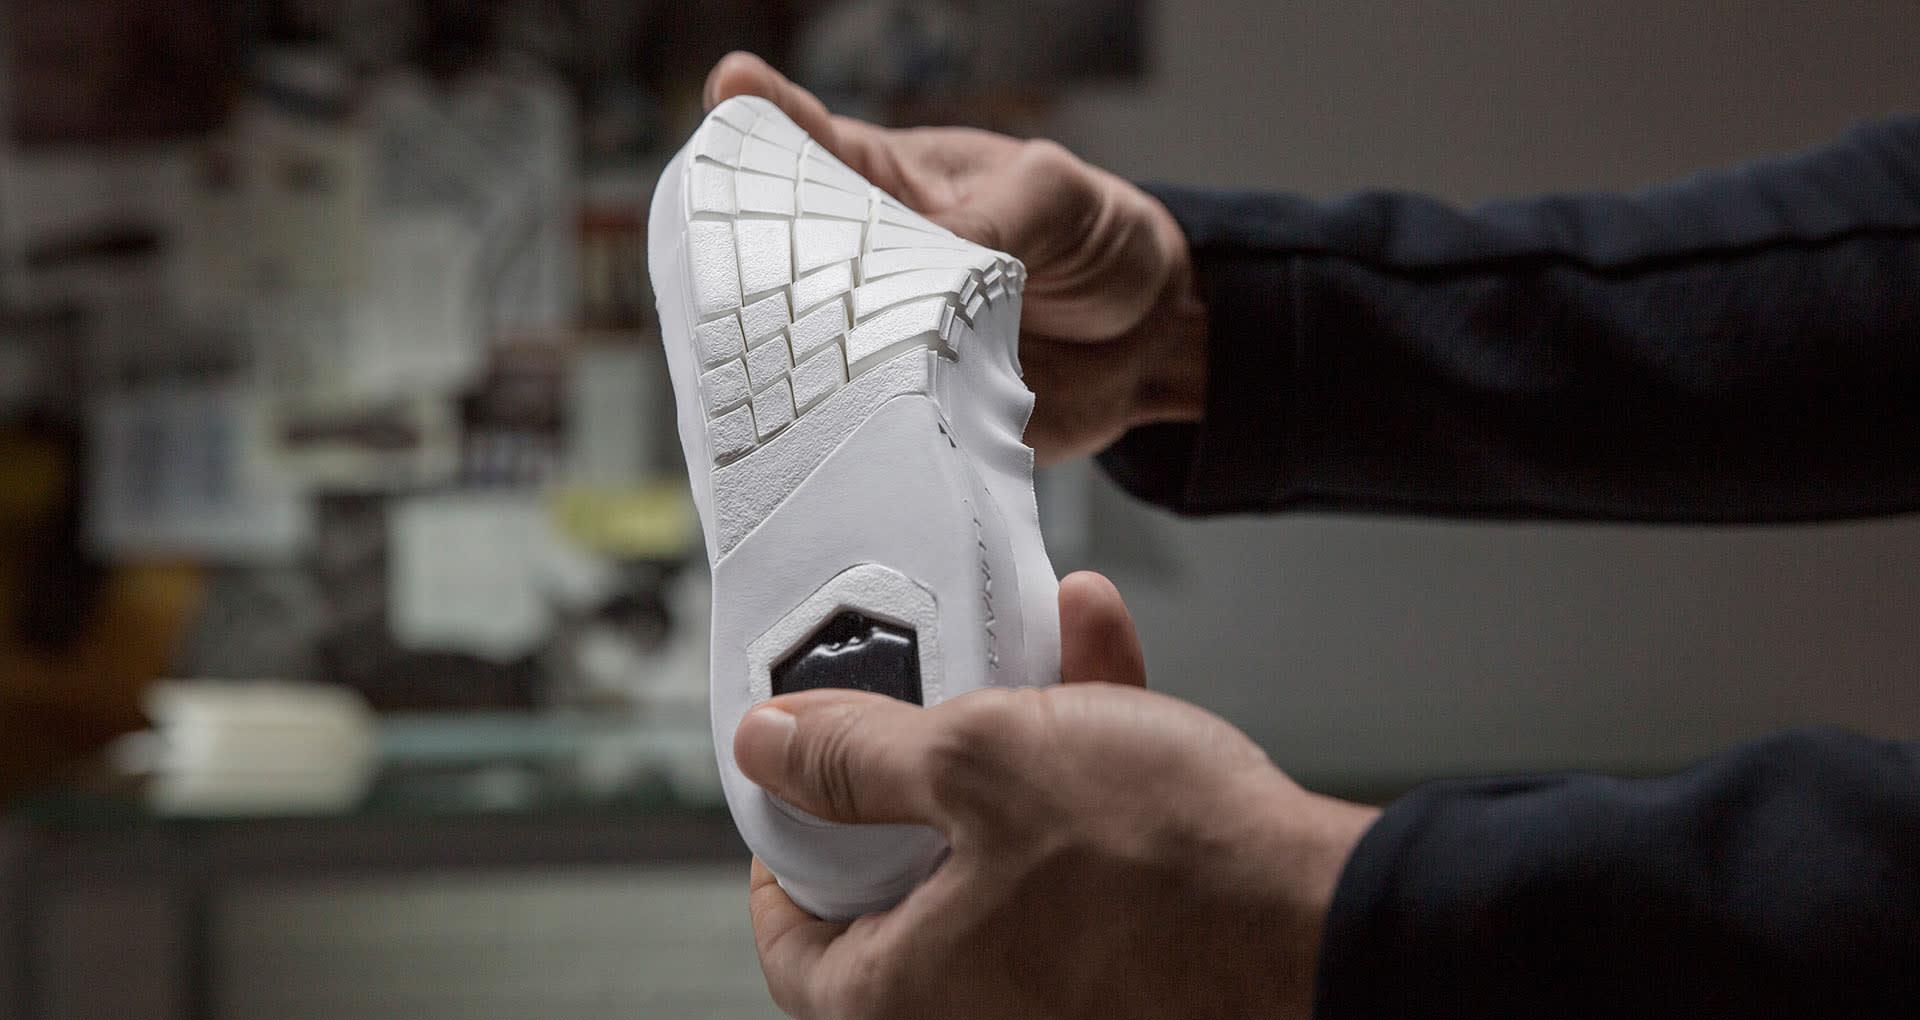 c95c8dc0b4ae Image via Nike Nike Air Force 1 Sport Luxury Vachetta Tan Insole